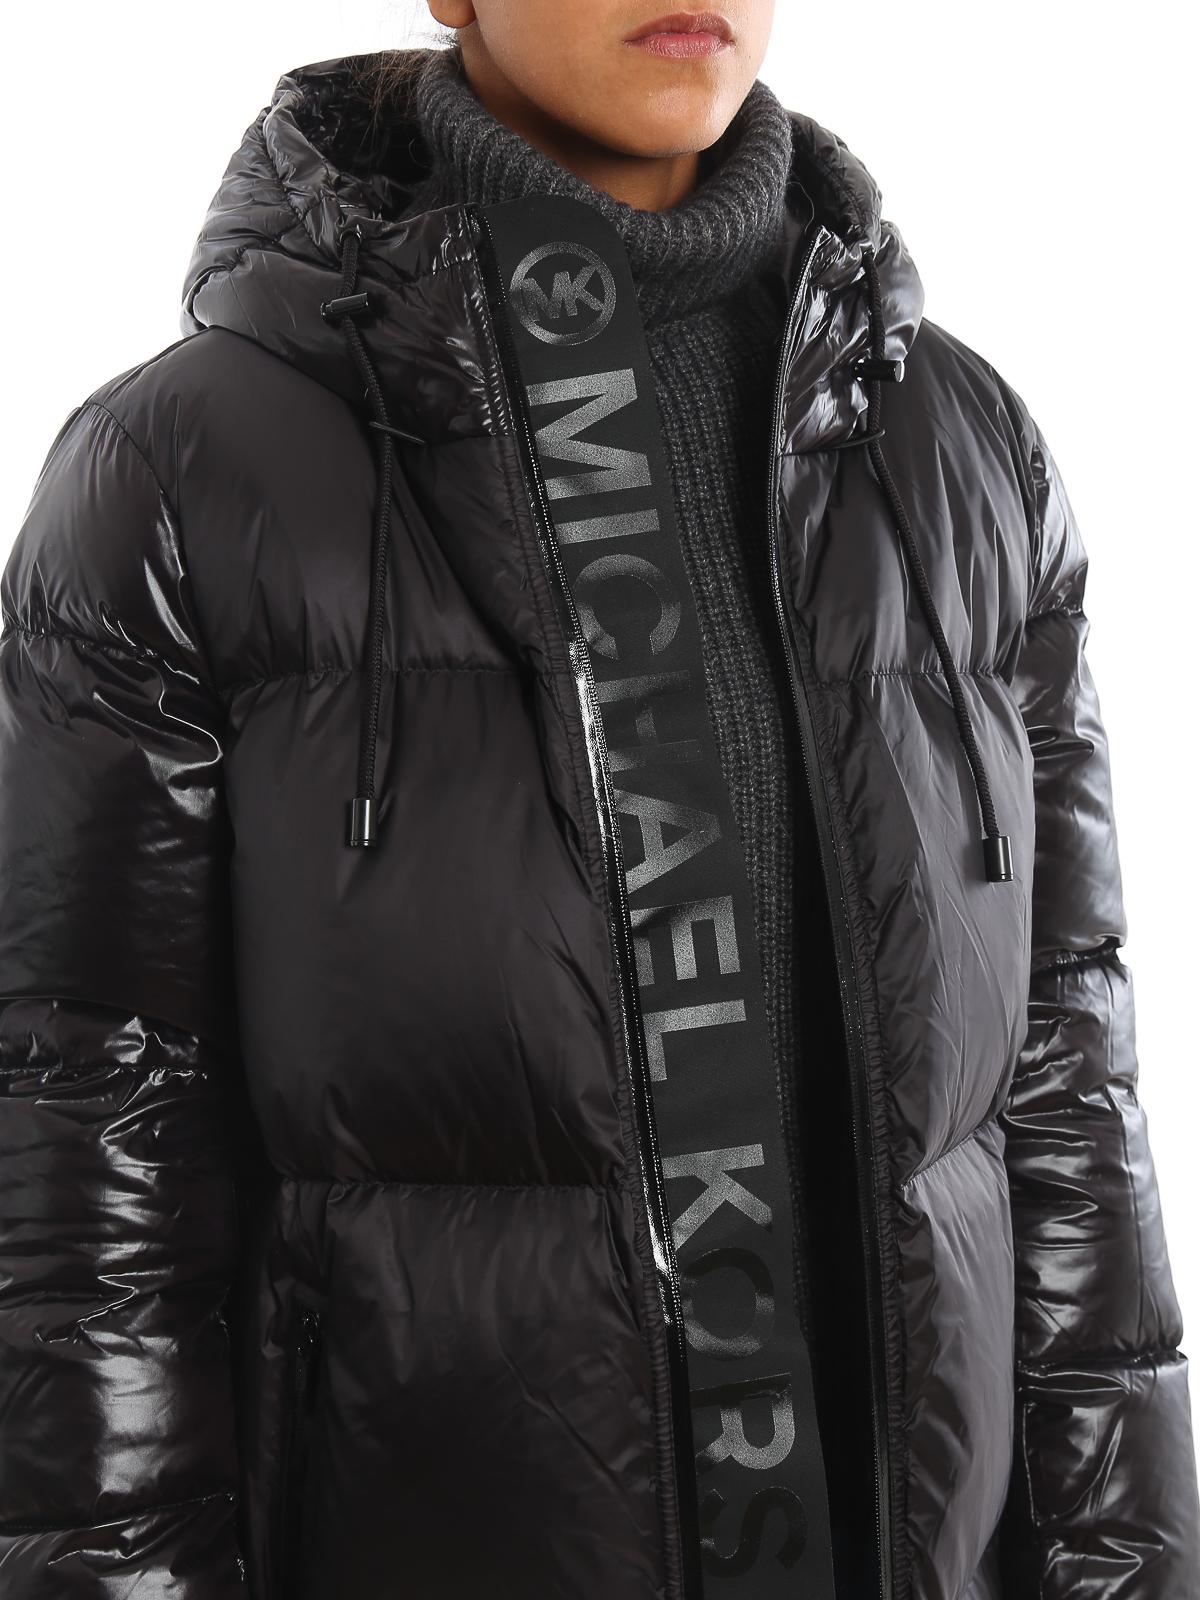 Jacke herren Michael Kors | Jacke Michael Michael Kors